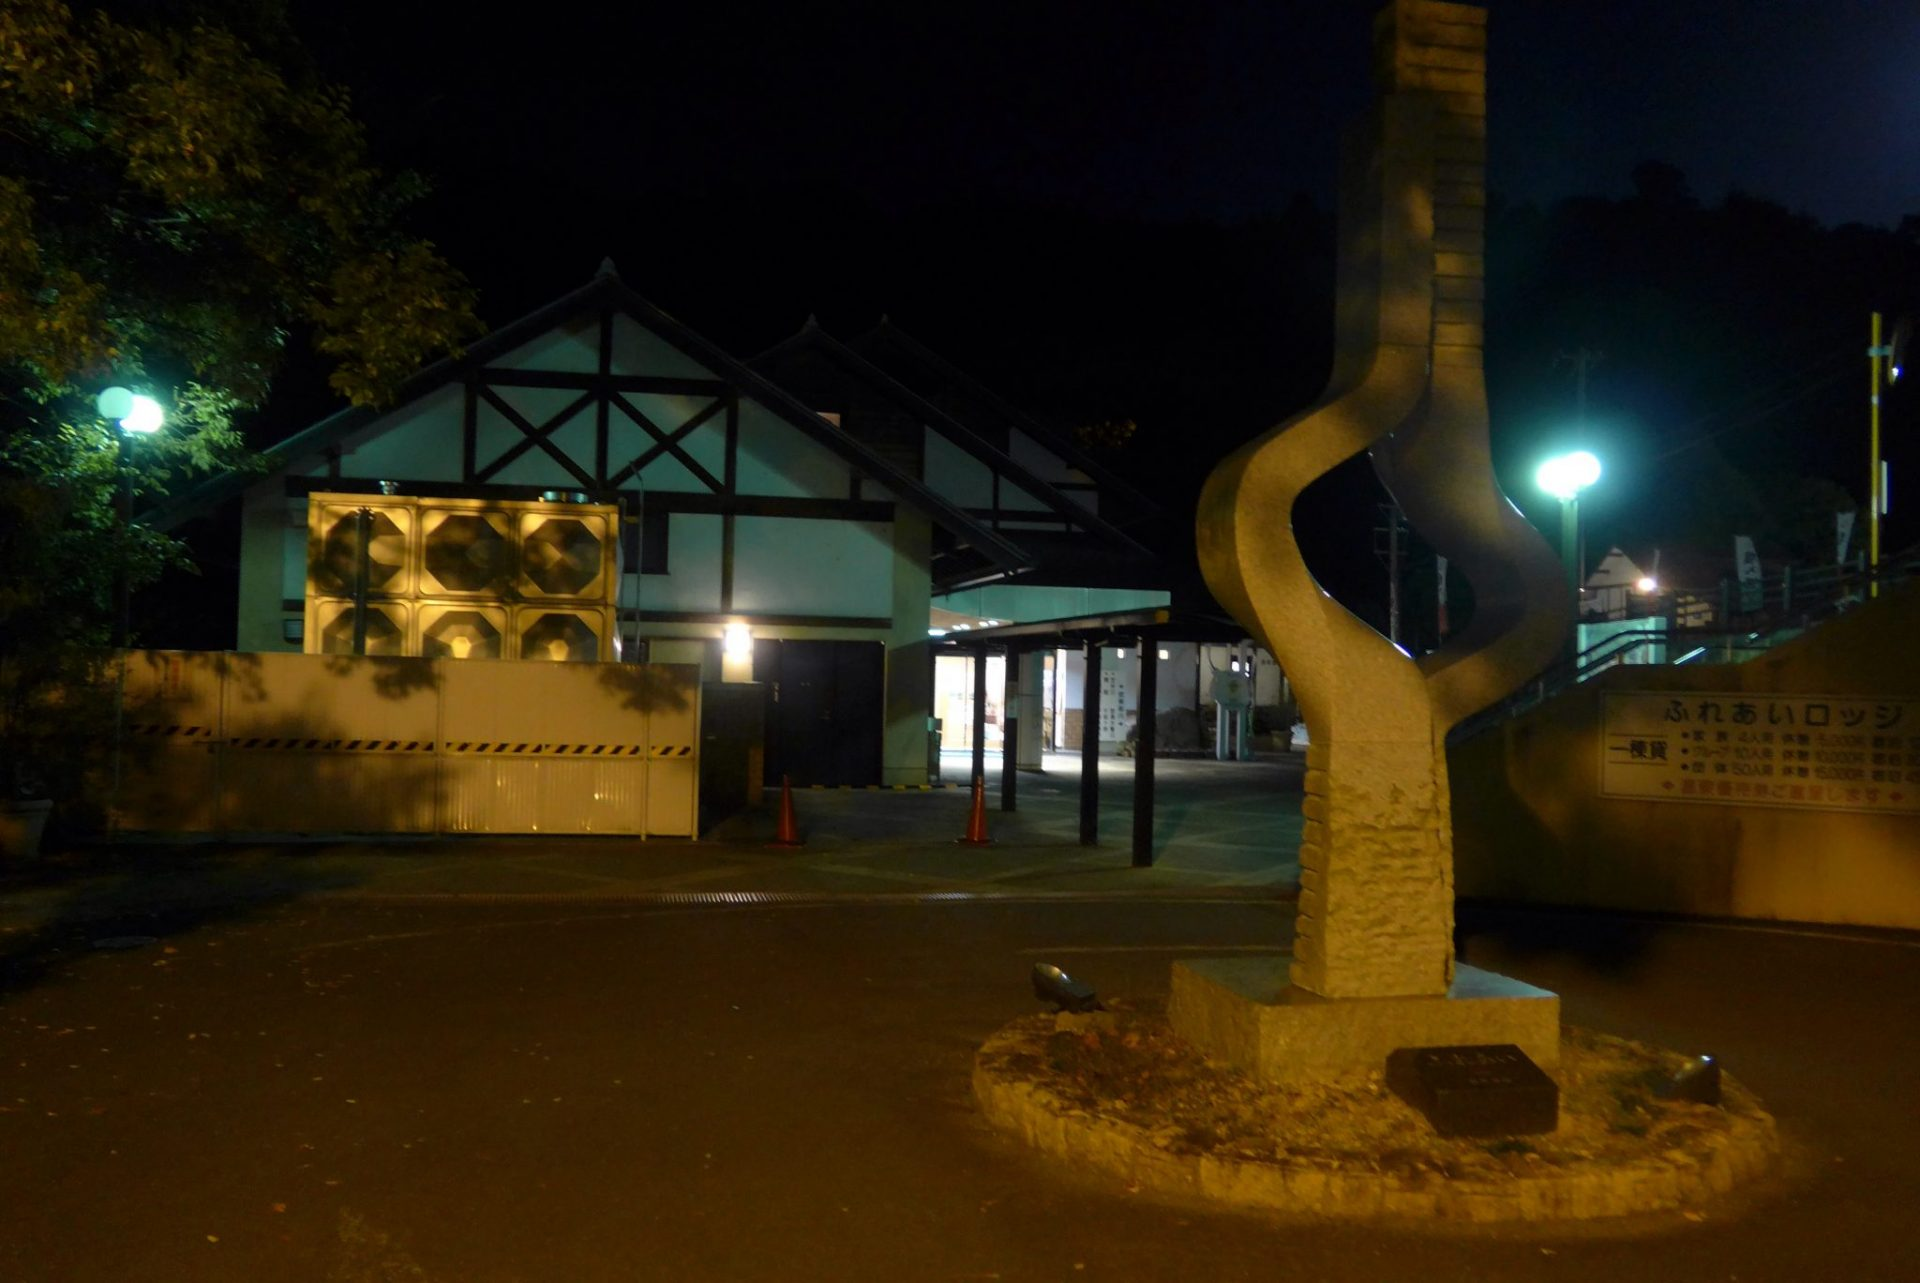 (K)香川県の塩入温泉は営業時間長い〜トロトロお湯を楽しもう〜